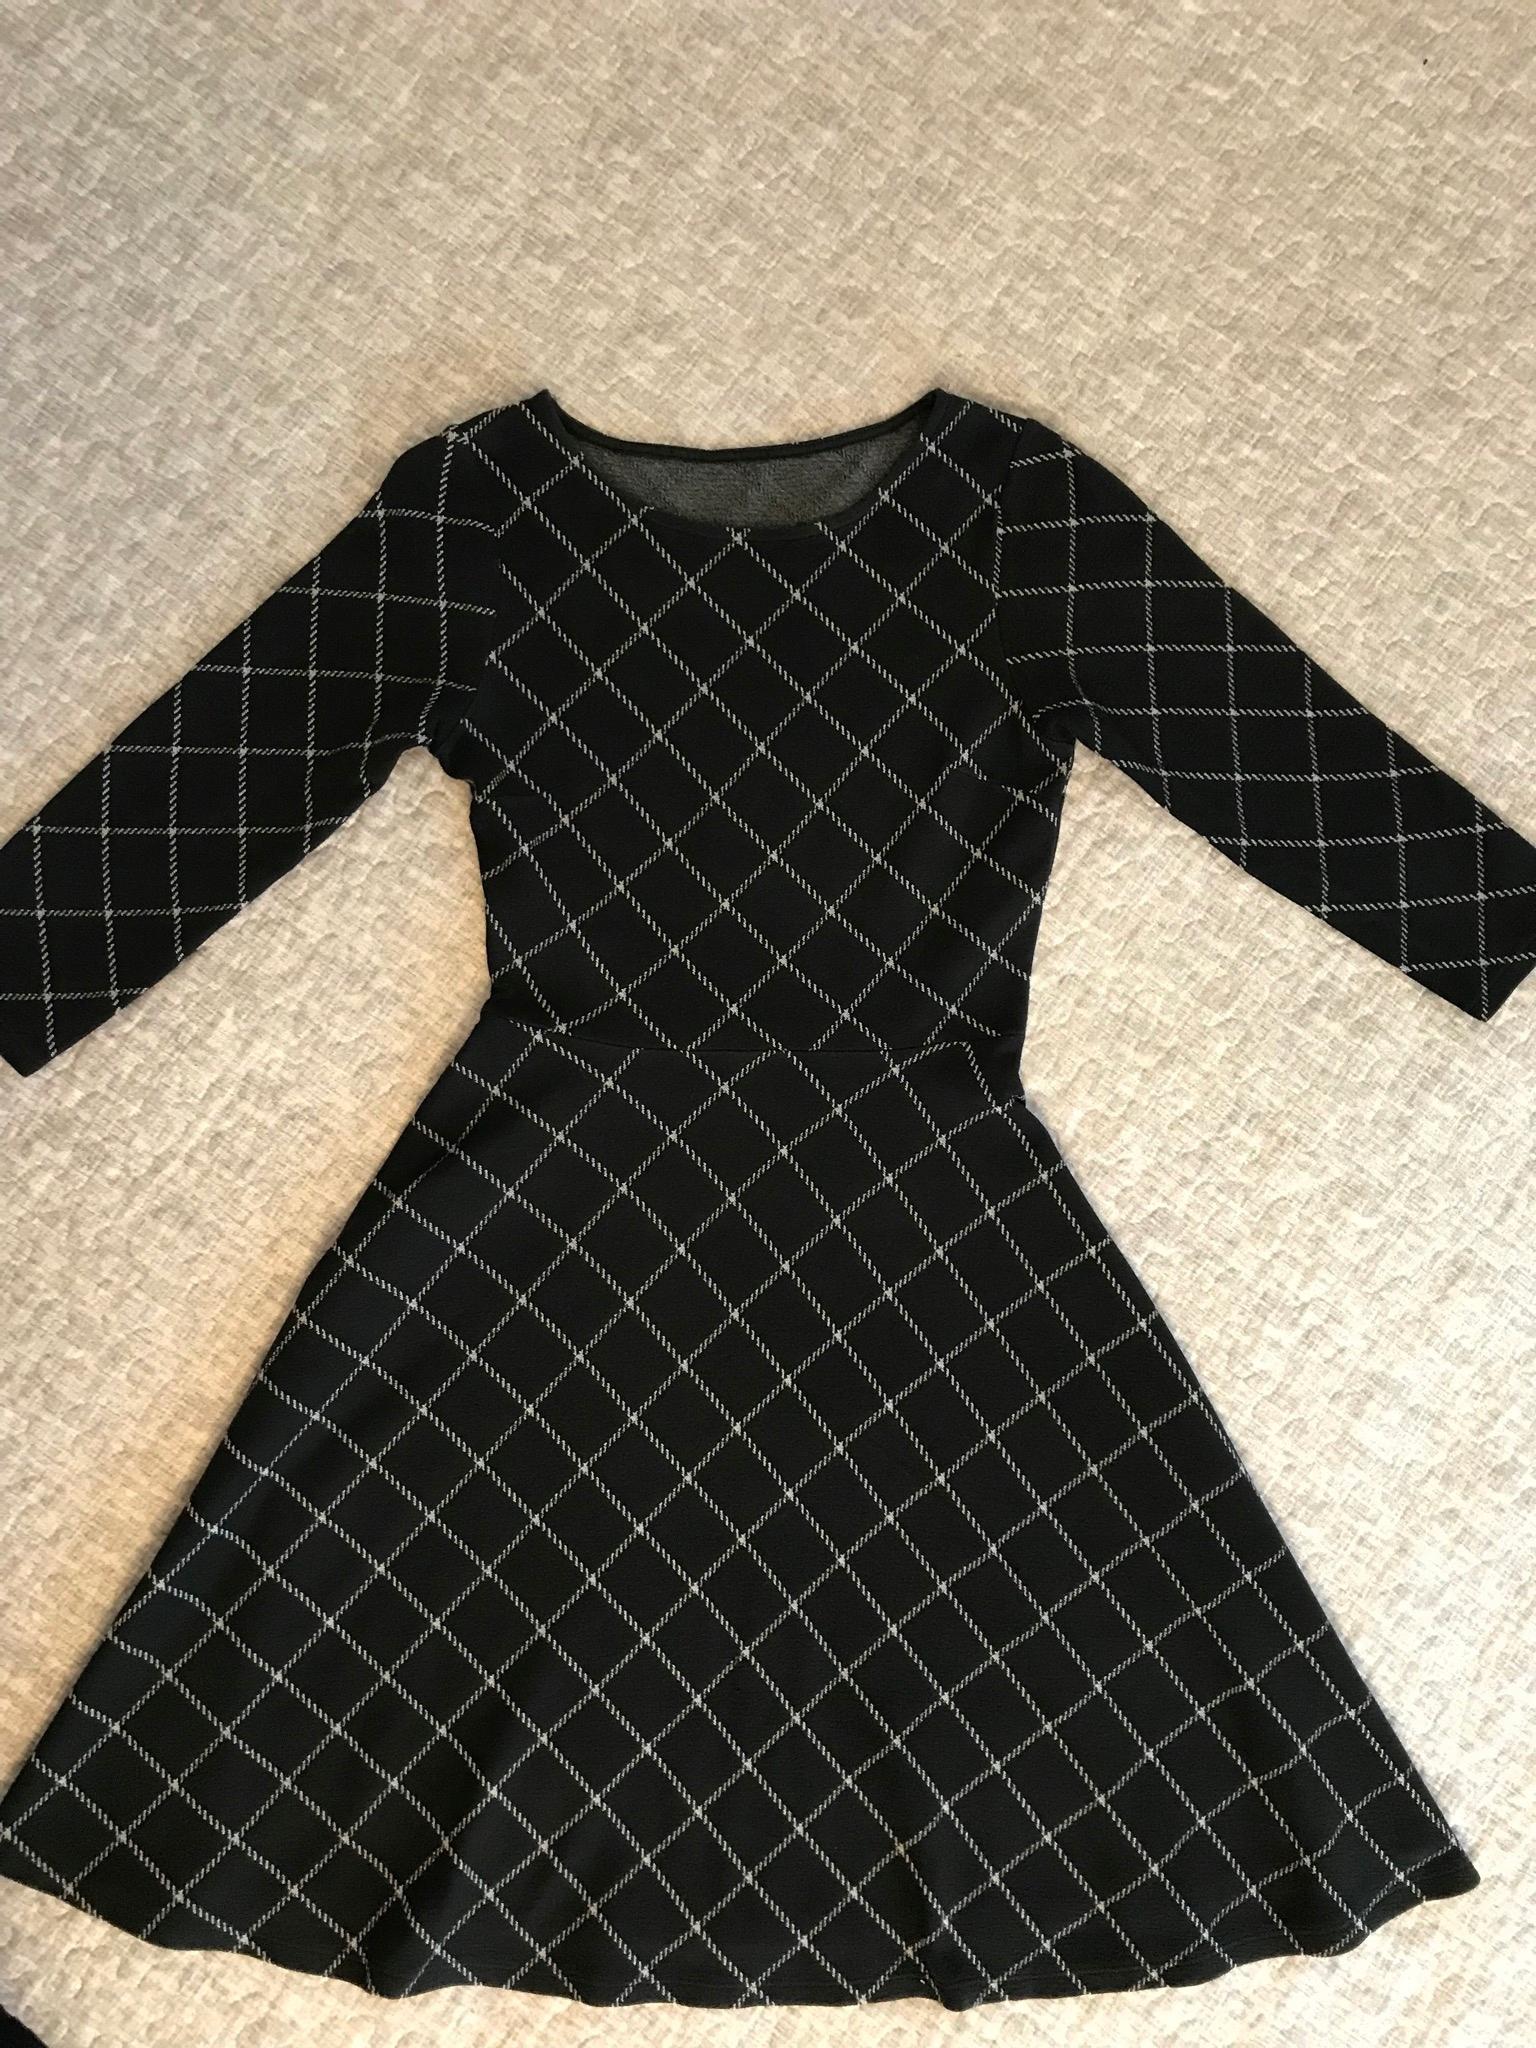 93e5bc5d58 Sukienka rozkloszowana Orsay 36-38 kratka - 7701316880 - oficjalne ...